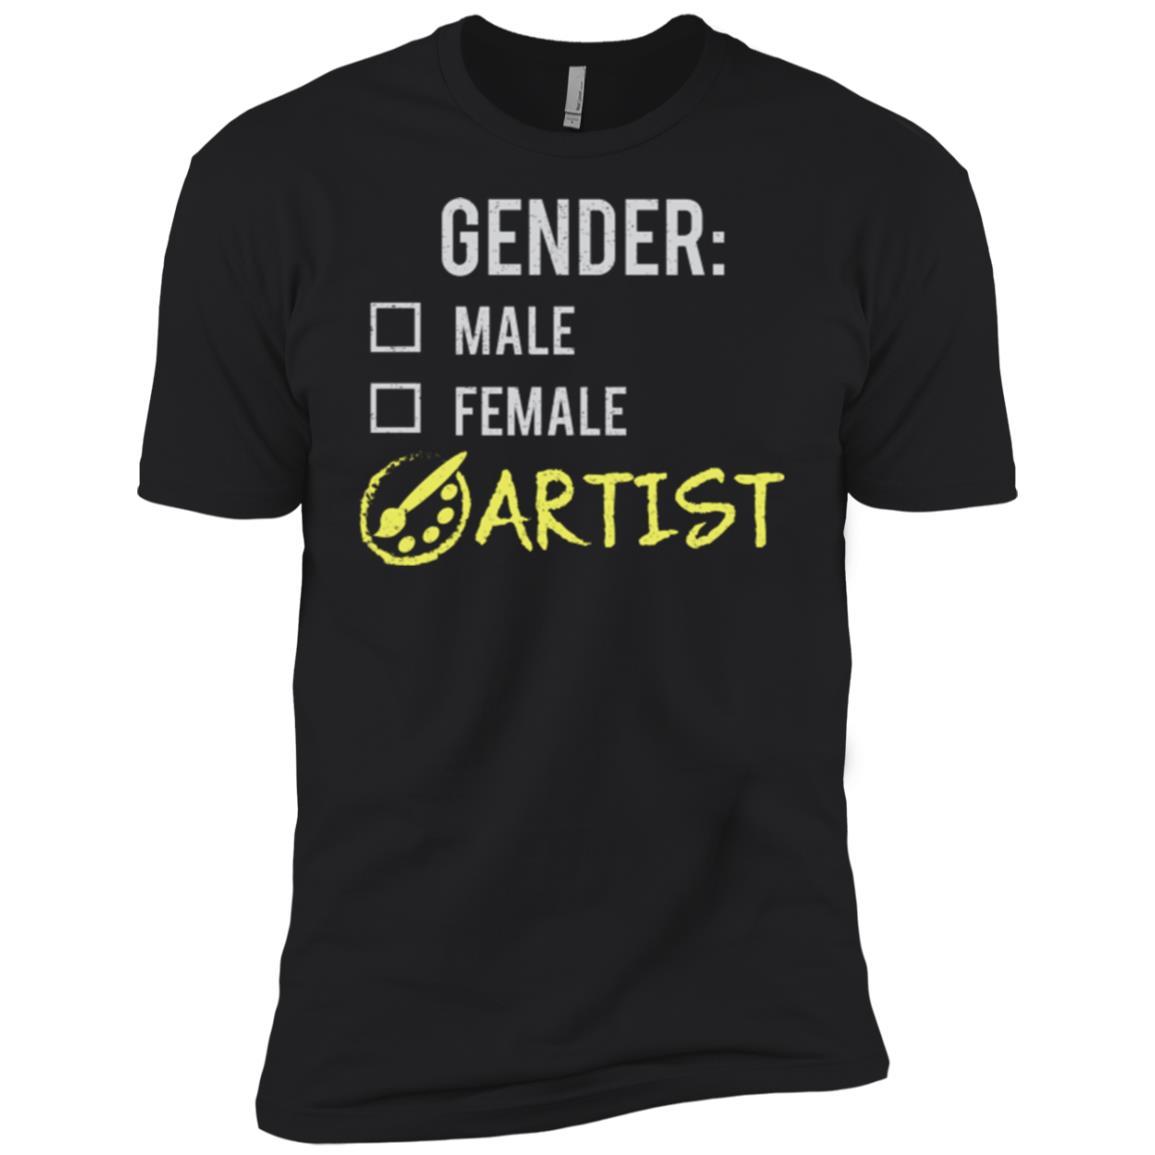 Male Female Artist Gender Nonbinary Trans Men Short Sleeve T-Shirt